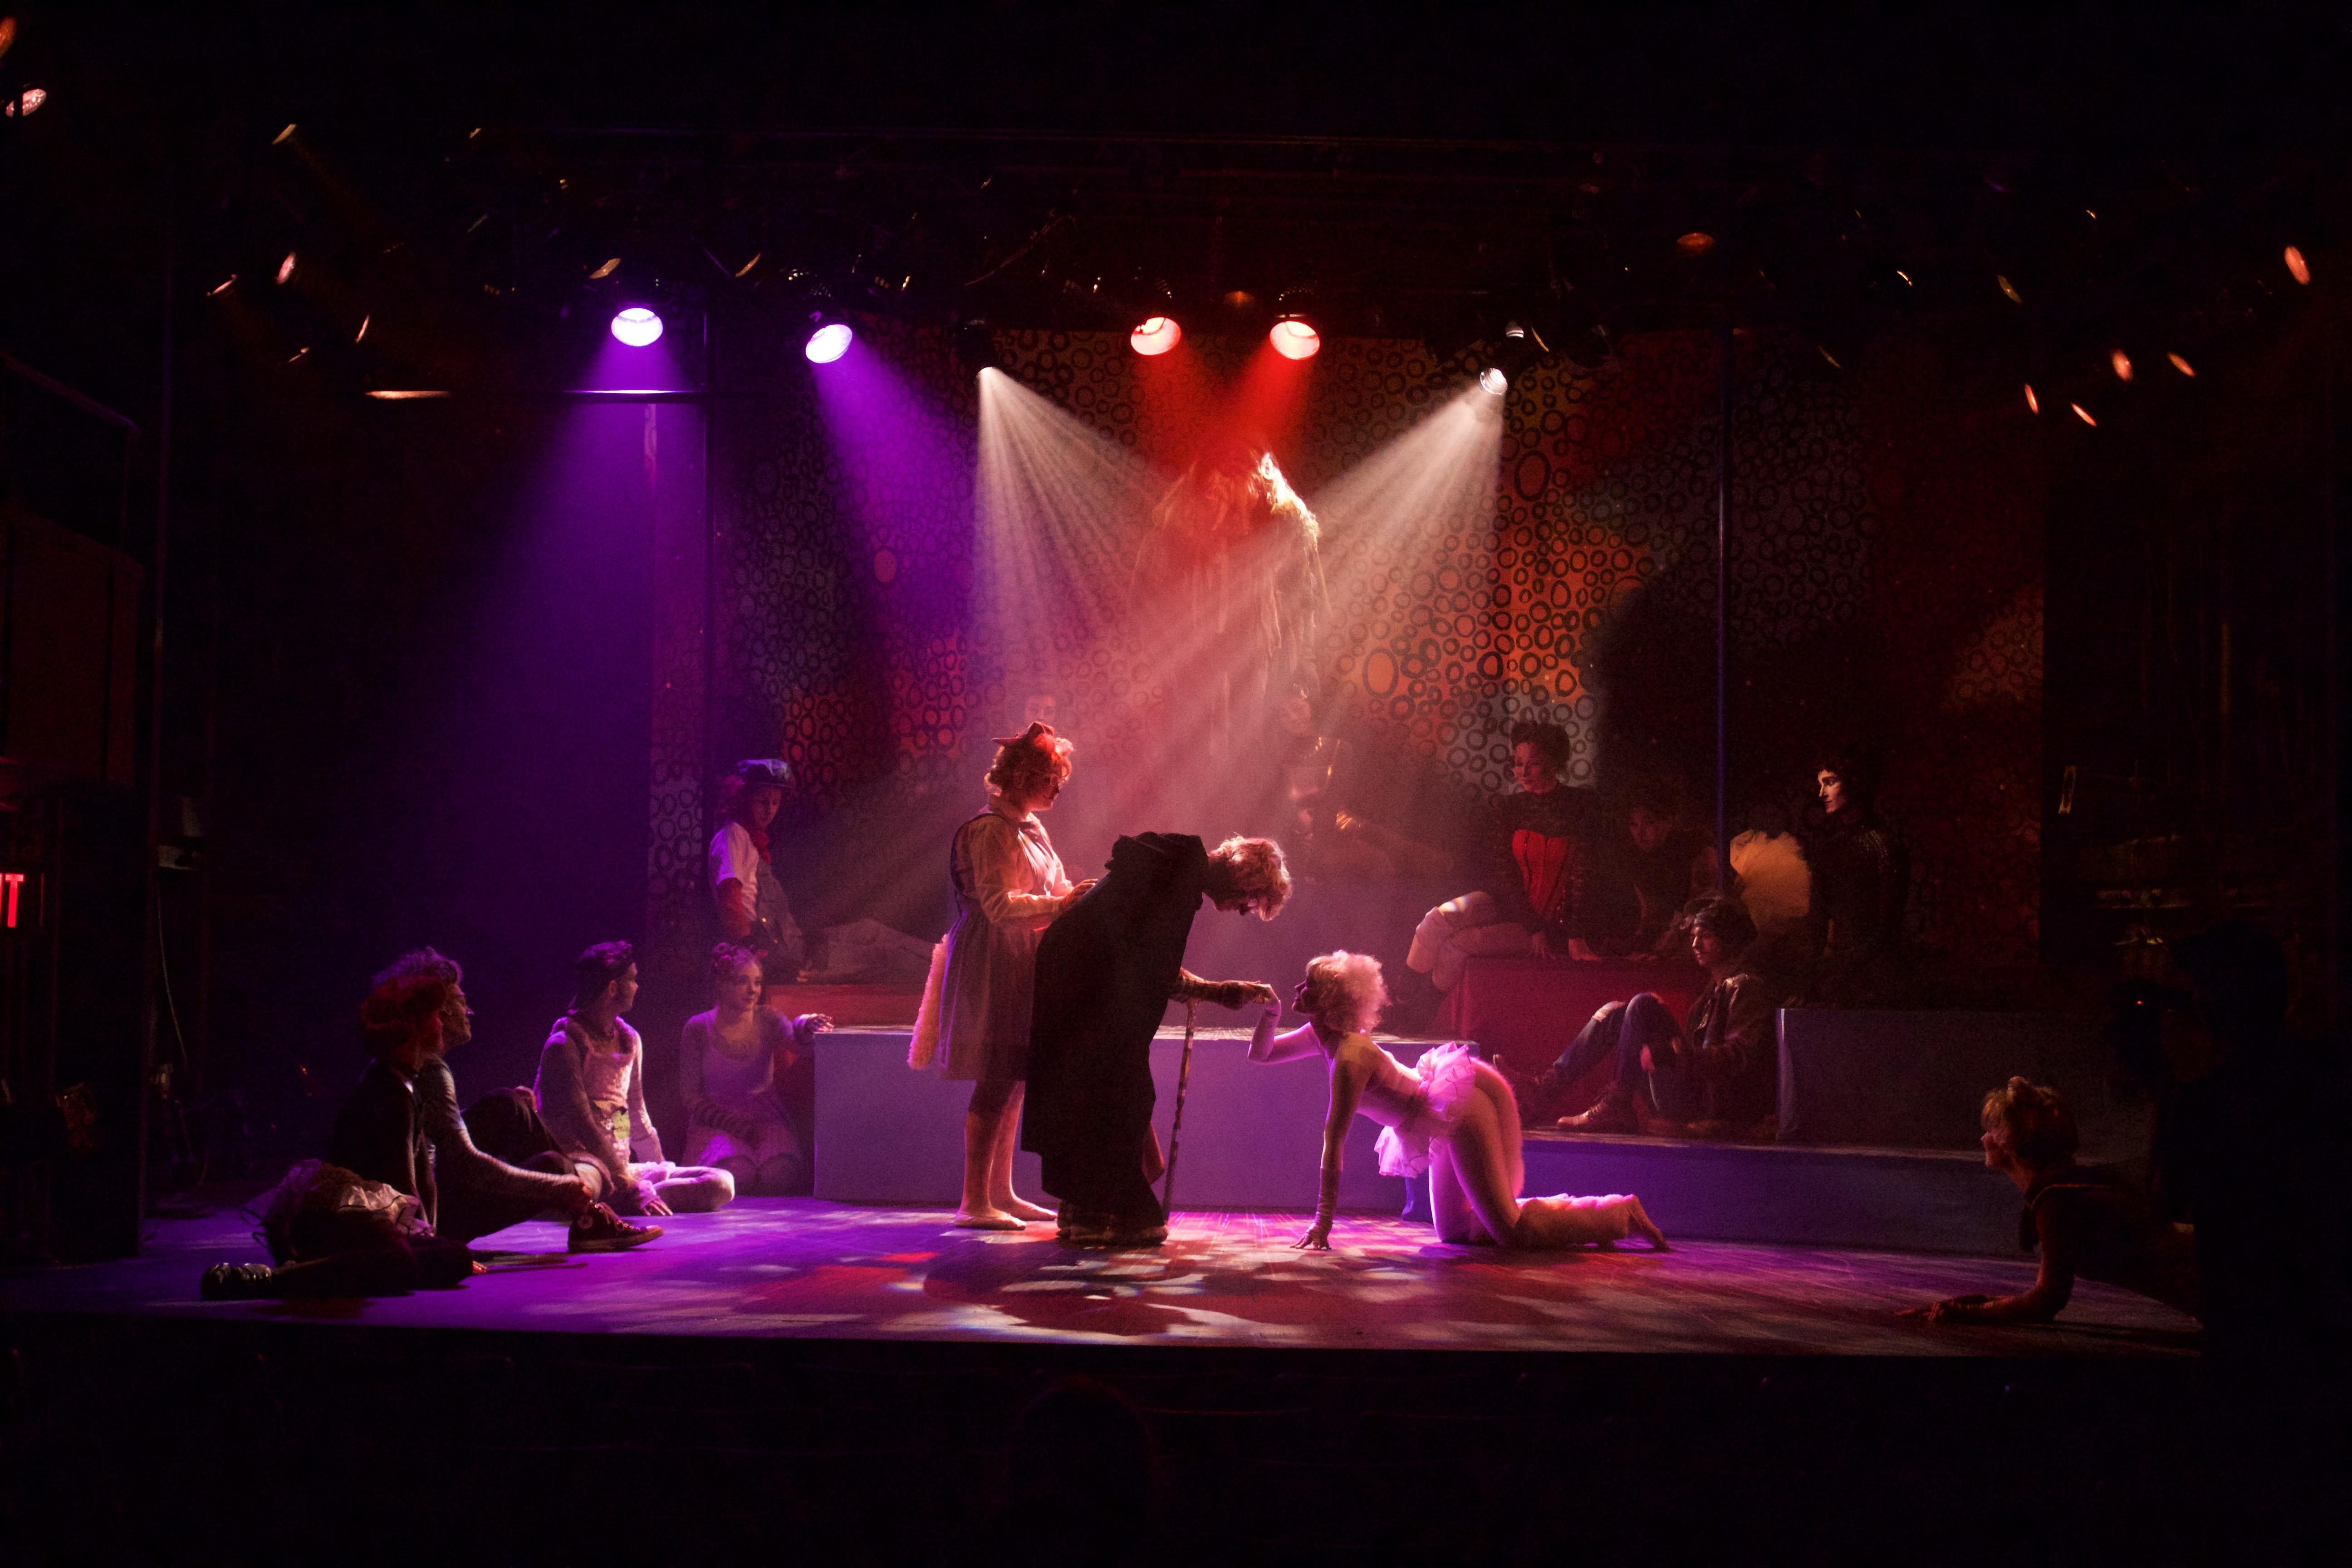 Gus the Theatre